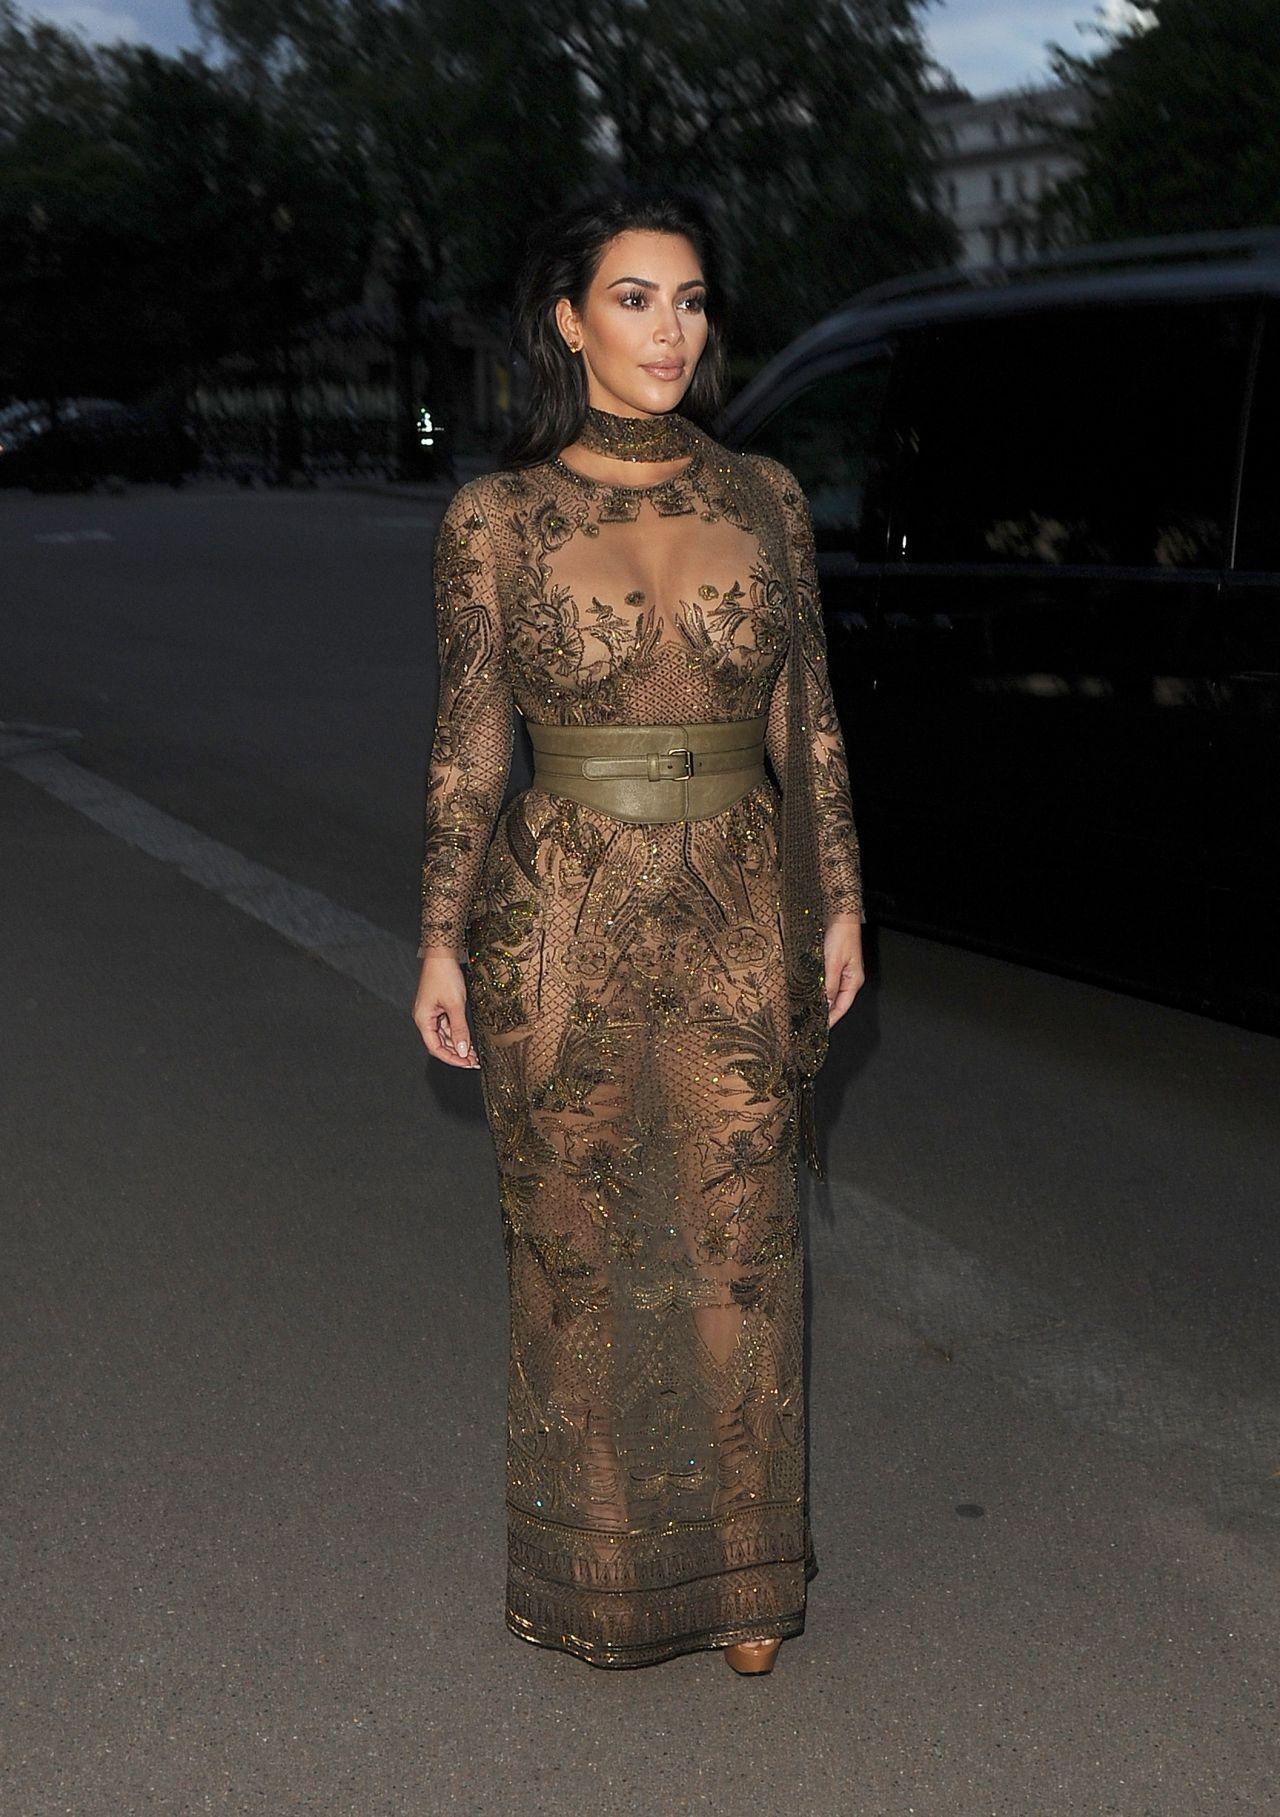 Kim Kardashian Vogue 100th Anniversary Gala Dinner In